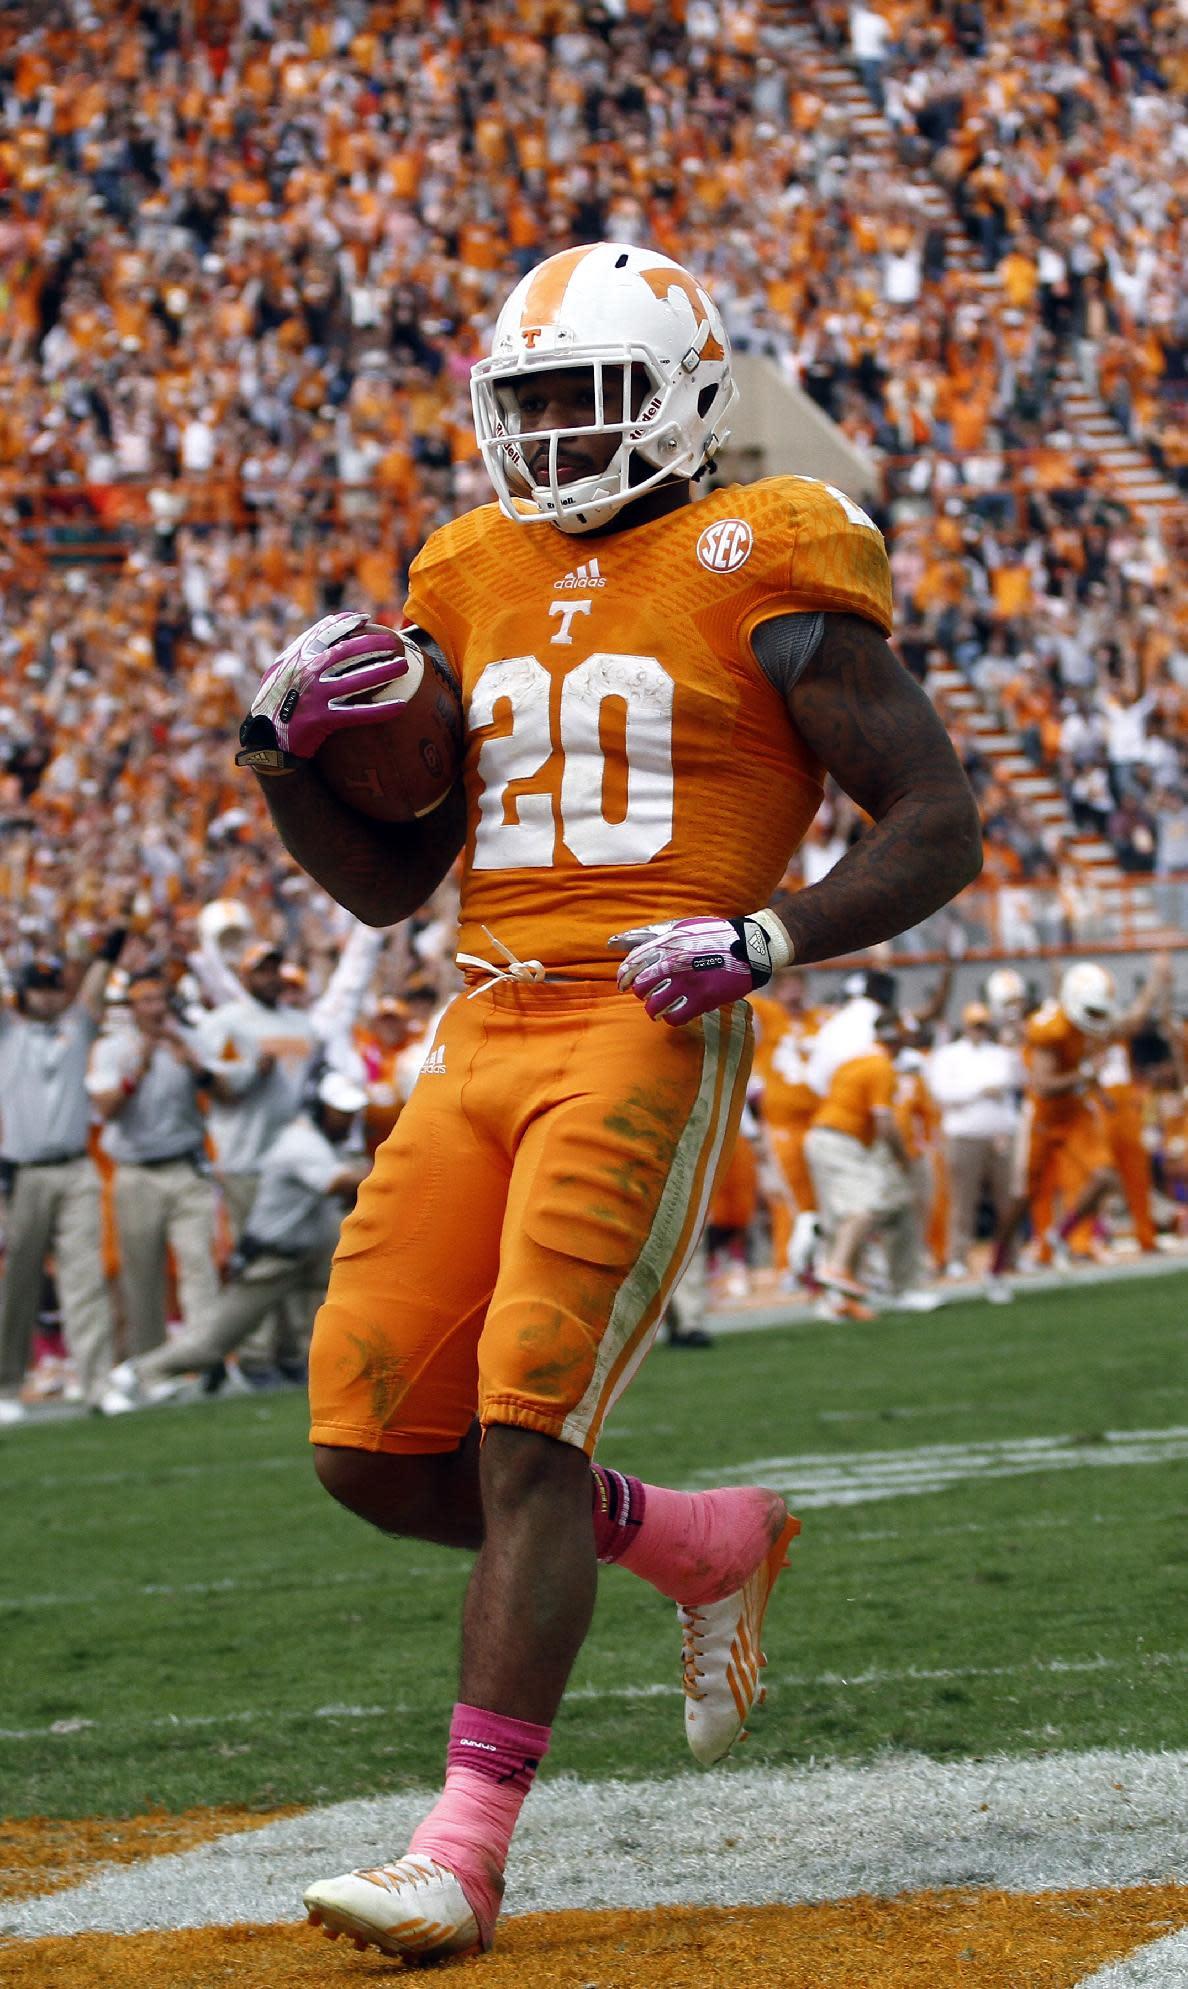 Tennessee to wear all-orange uniforms vs. Alabama (Photos)